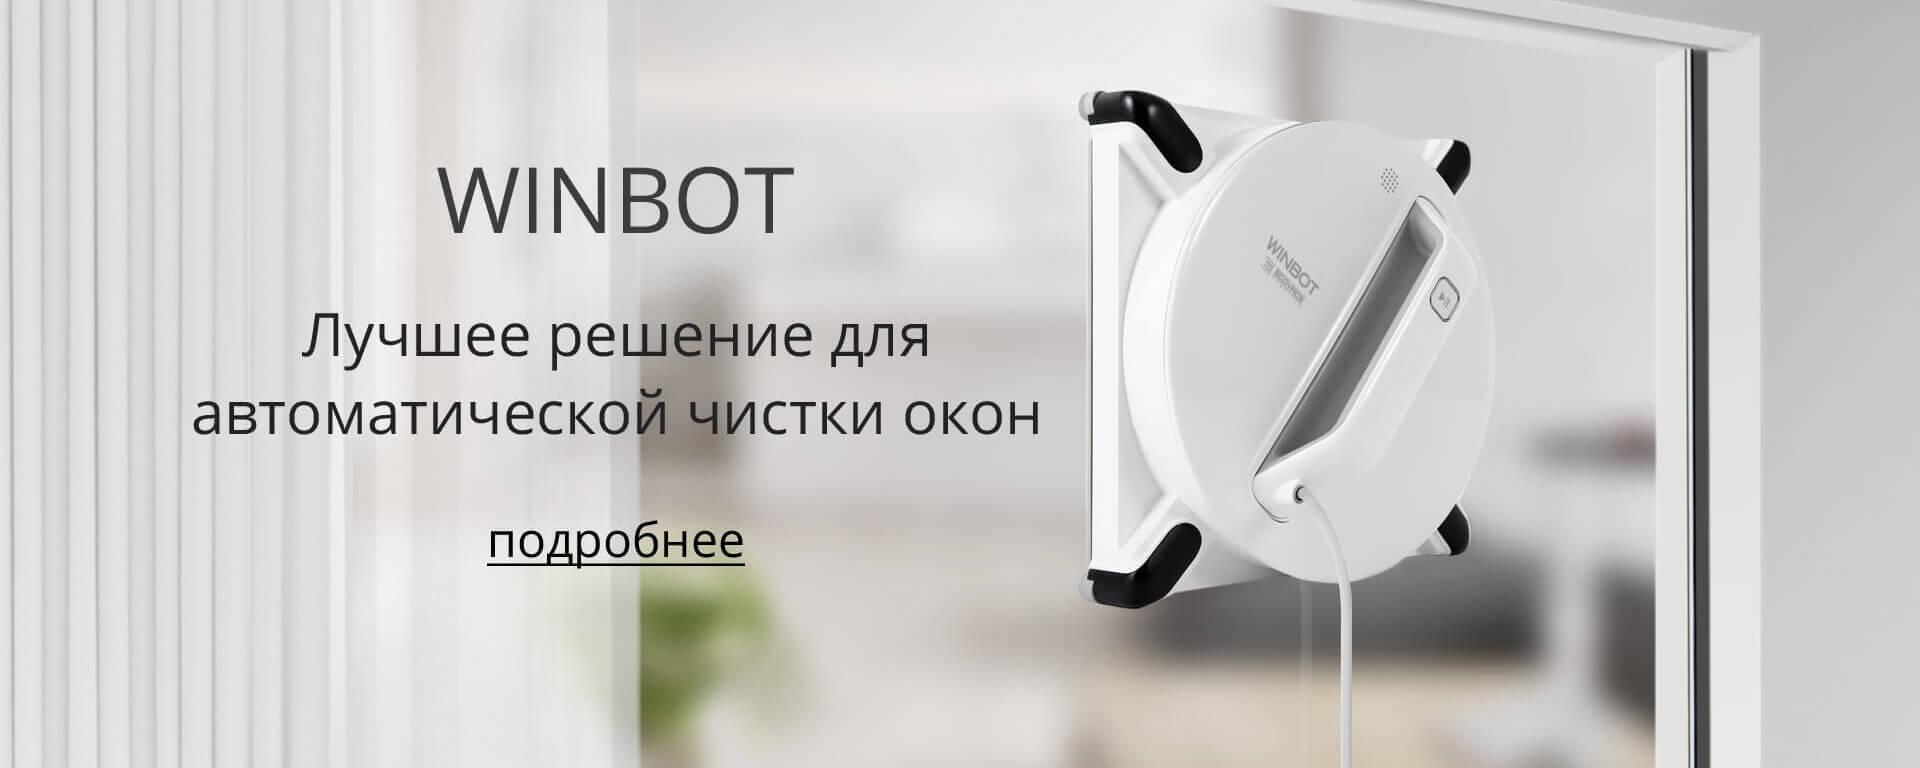 Ecovacs - Winbot